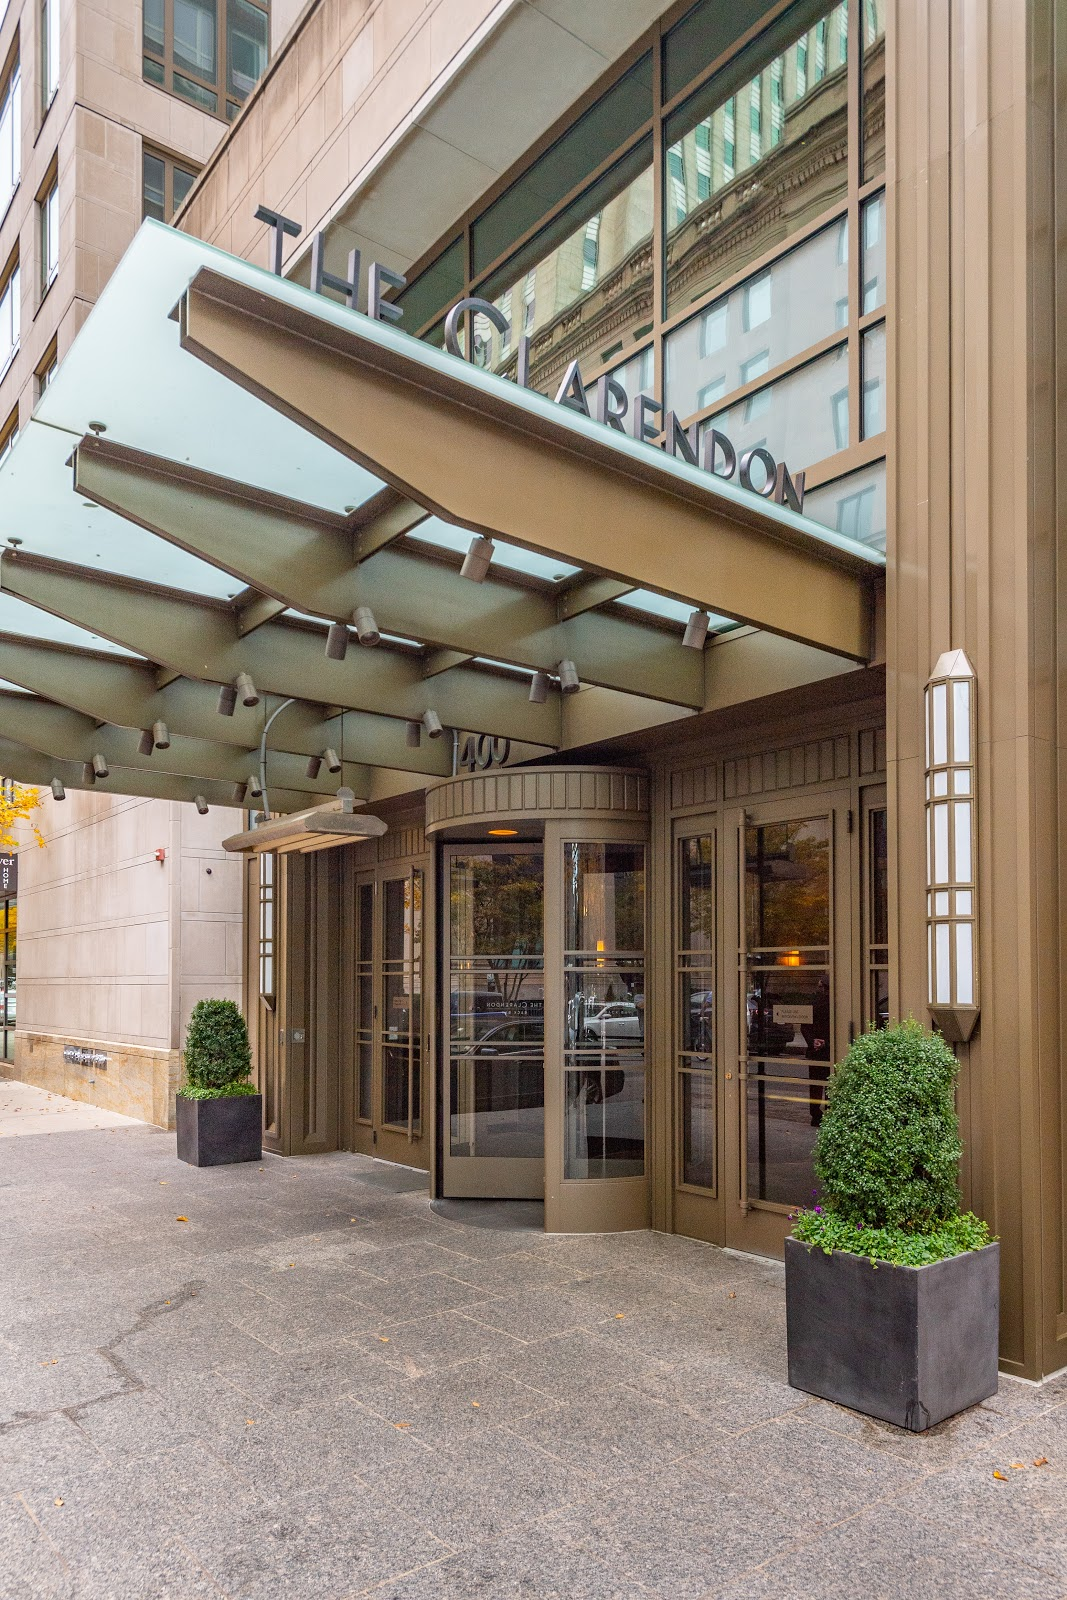 The Clarendon Entrance